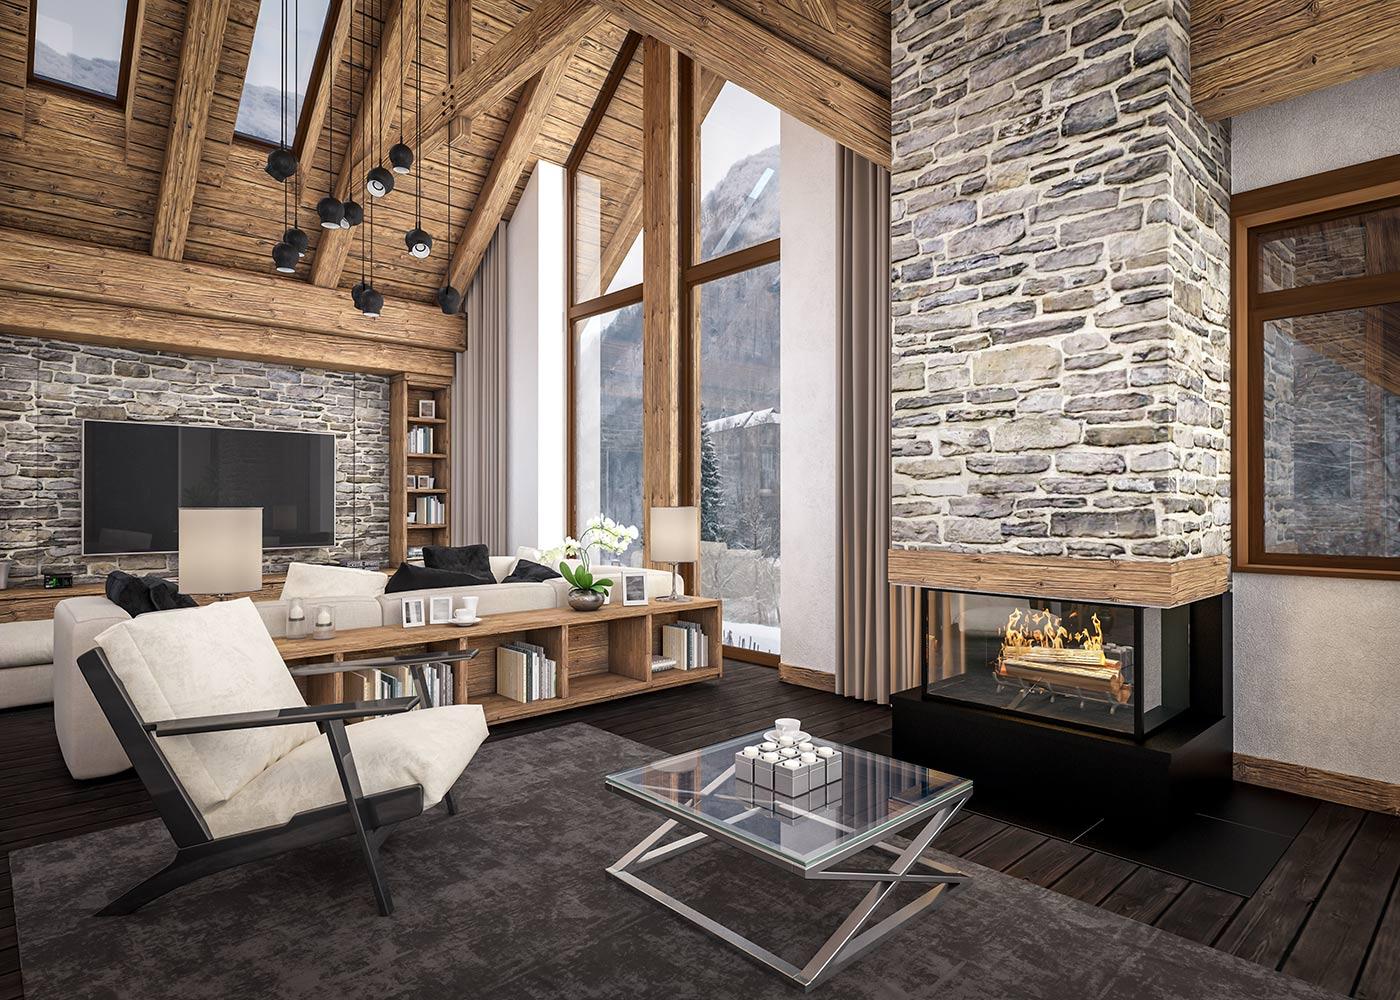 Arredamento Casa Moderno arredo rustico moderno: cos'è e come adattarlo a casa